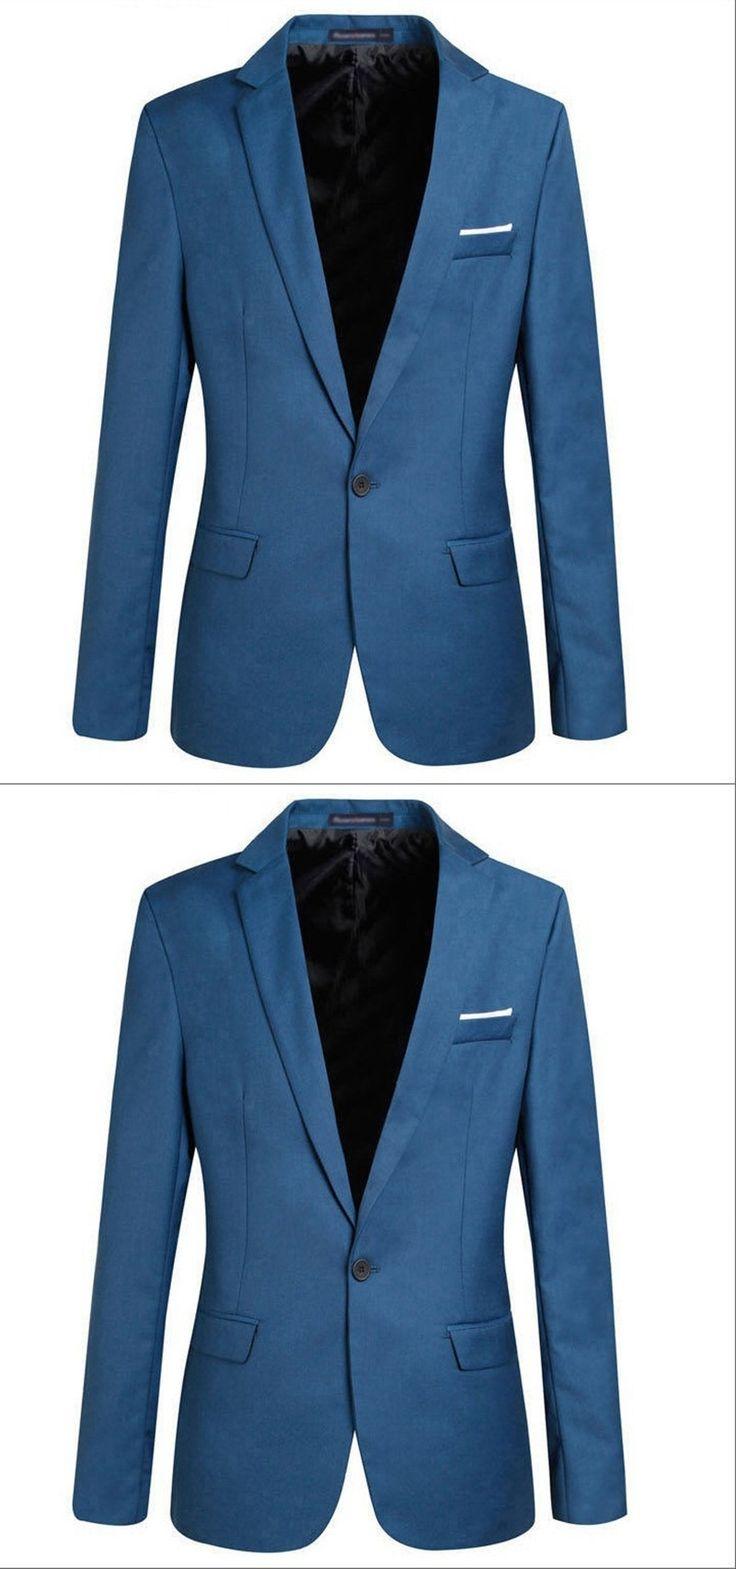 New HOT 2017 Suit Jacket For Men Terno Masculino Suit Blazers Jackets Traje Hombre Men's Casual Blazer 2 Colors Size S-XXL